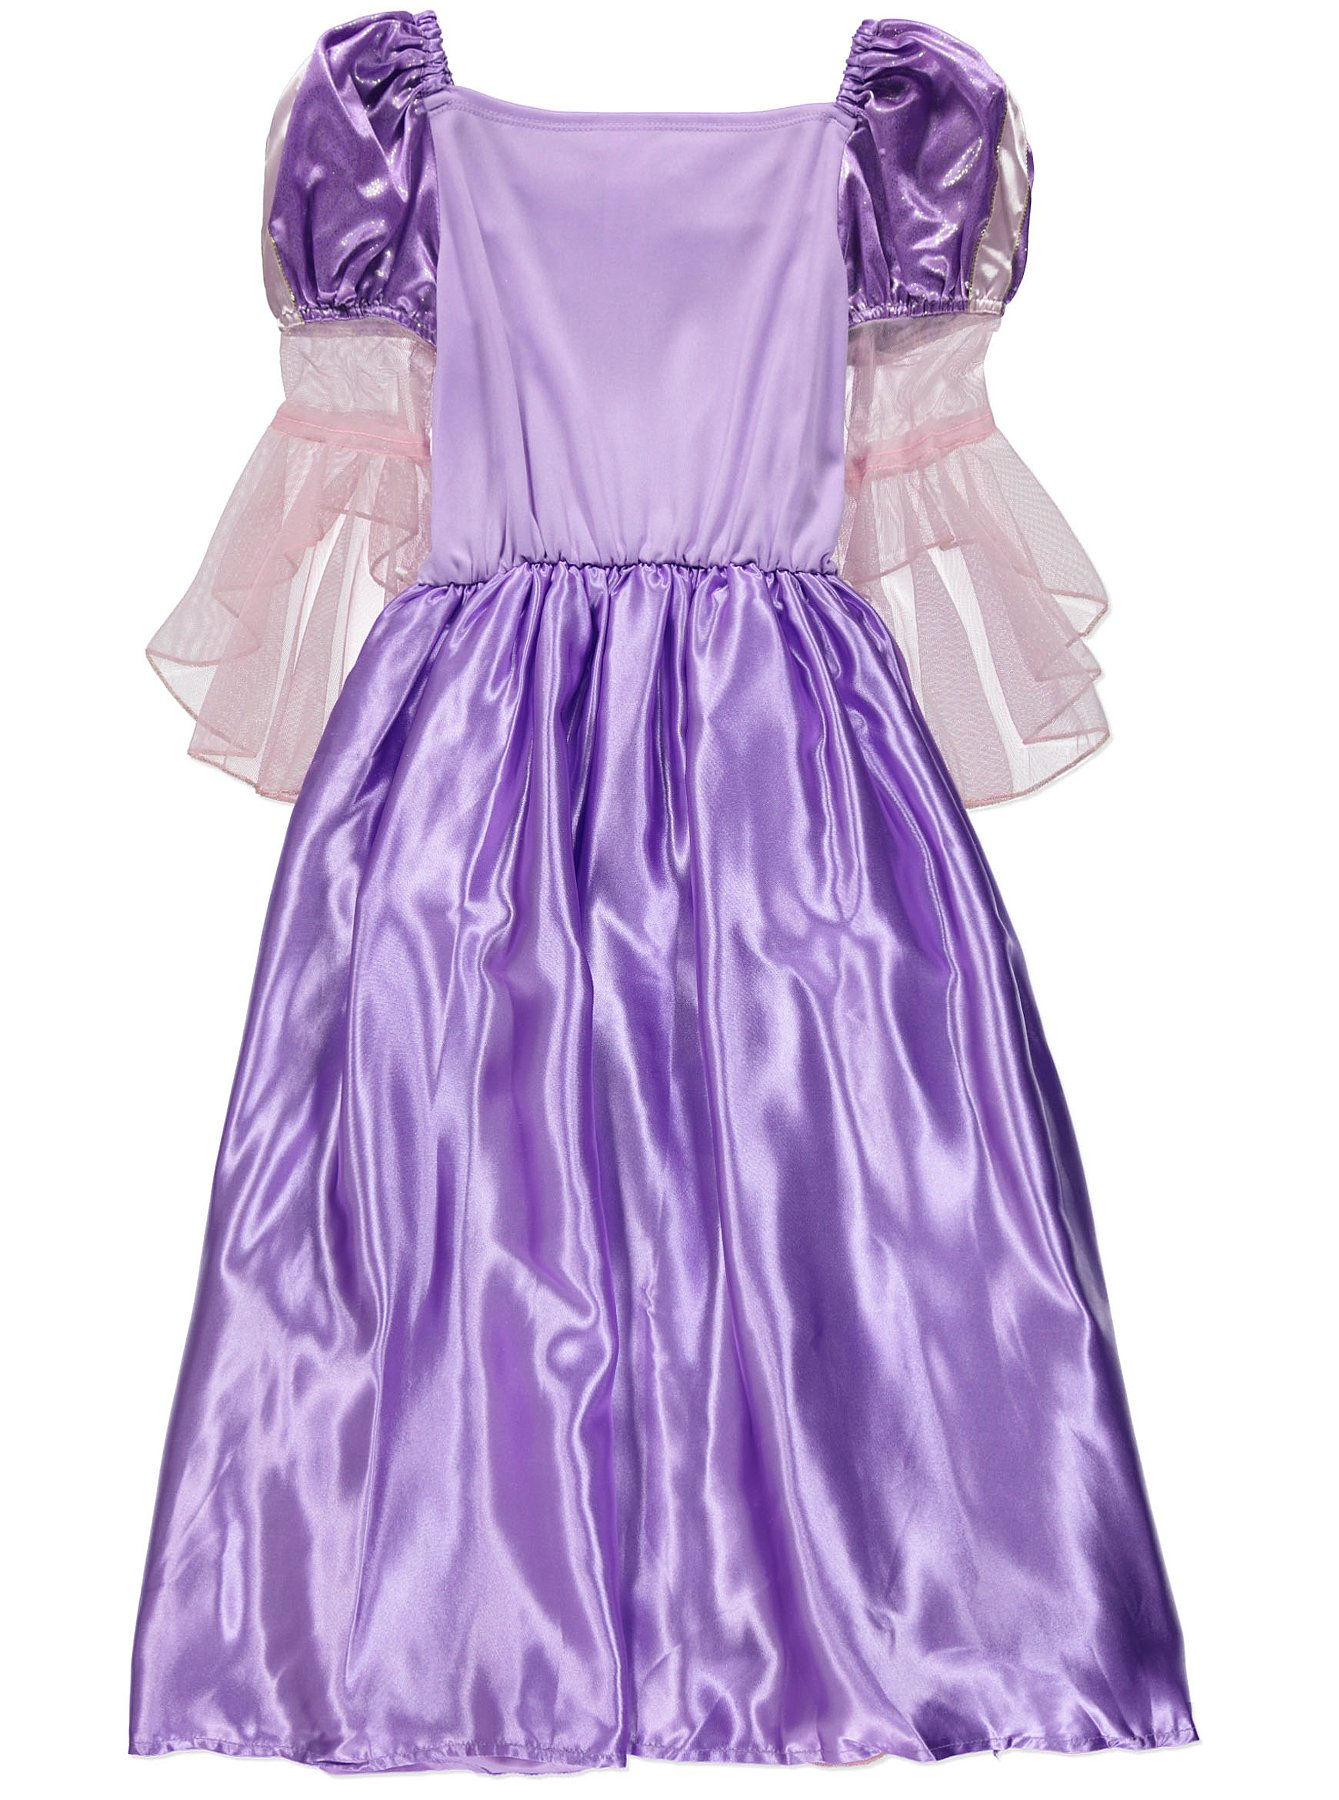 Disney Princess Rapunzel Fancy Dress Costume   Kids   George at ASDA